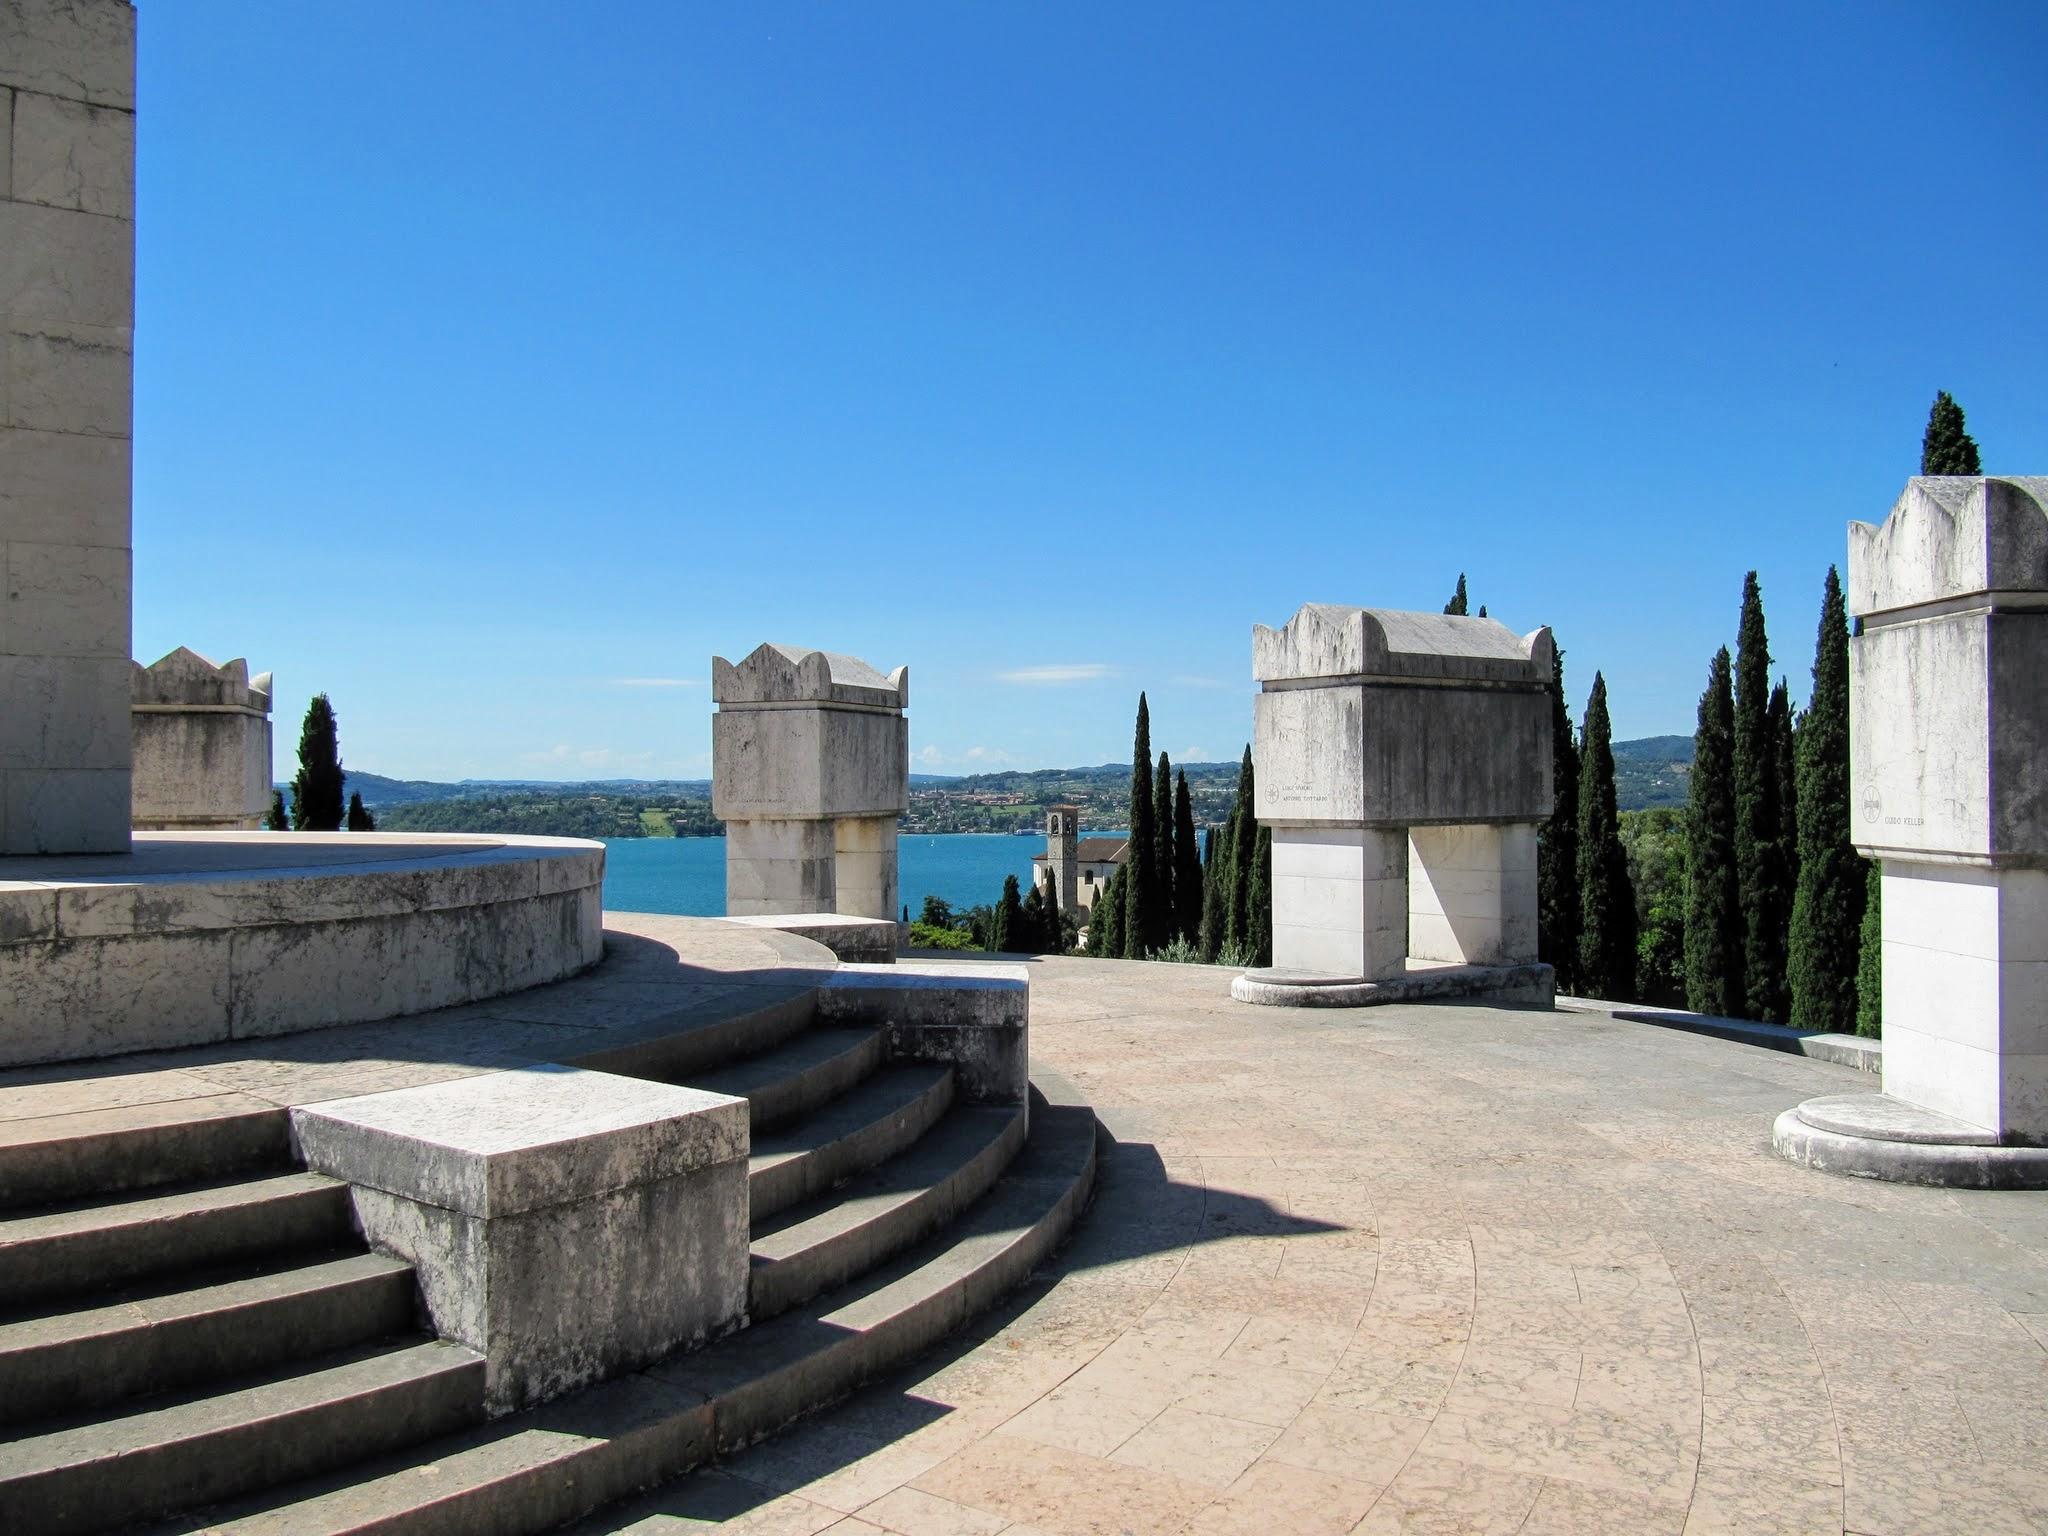 Mausoleum Gardone Riviera Gardameer